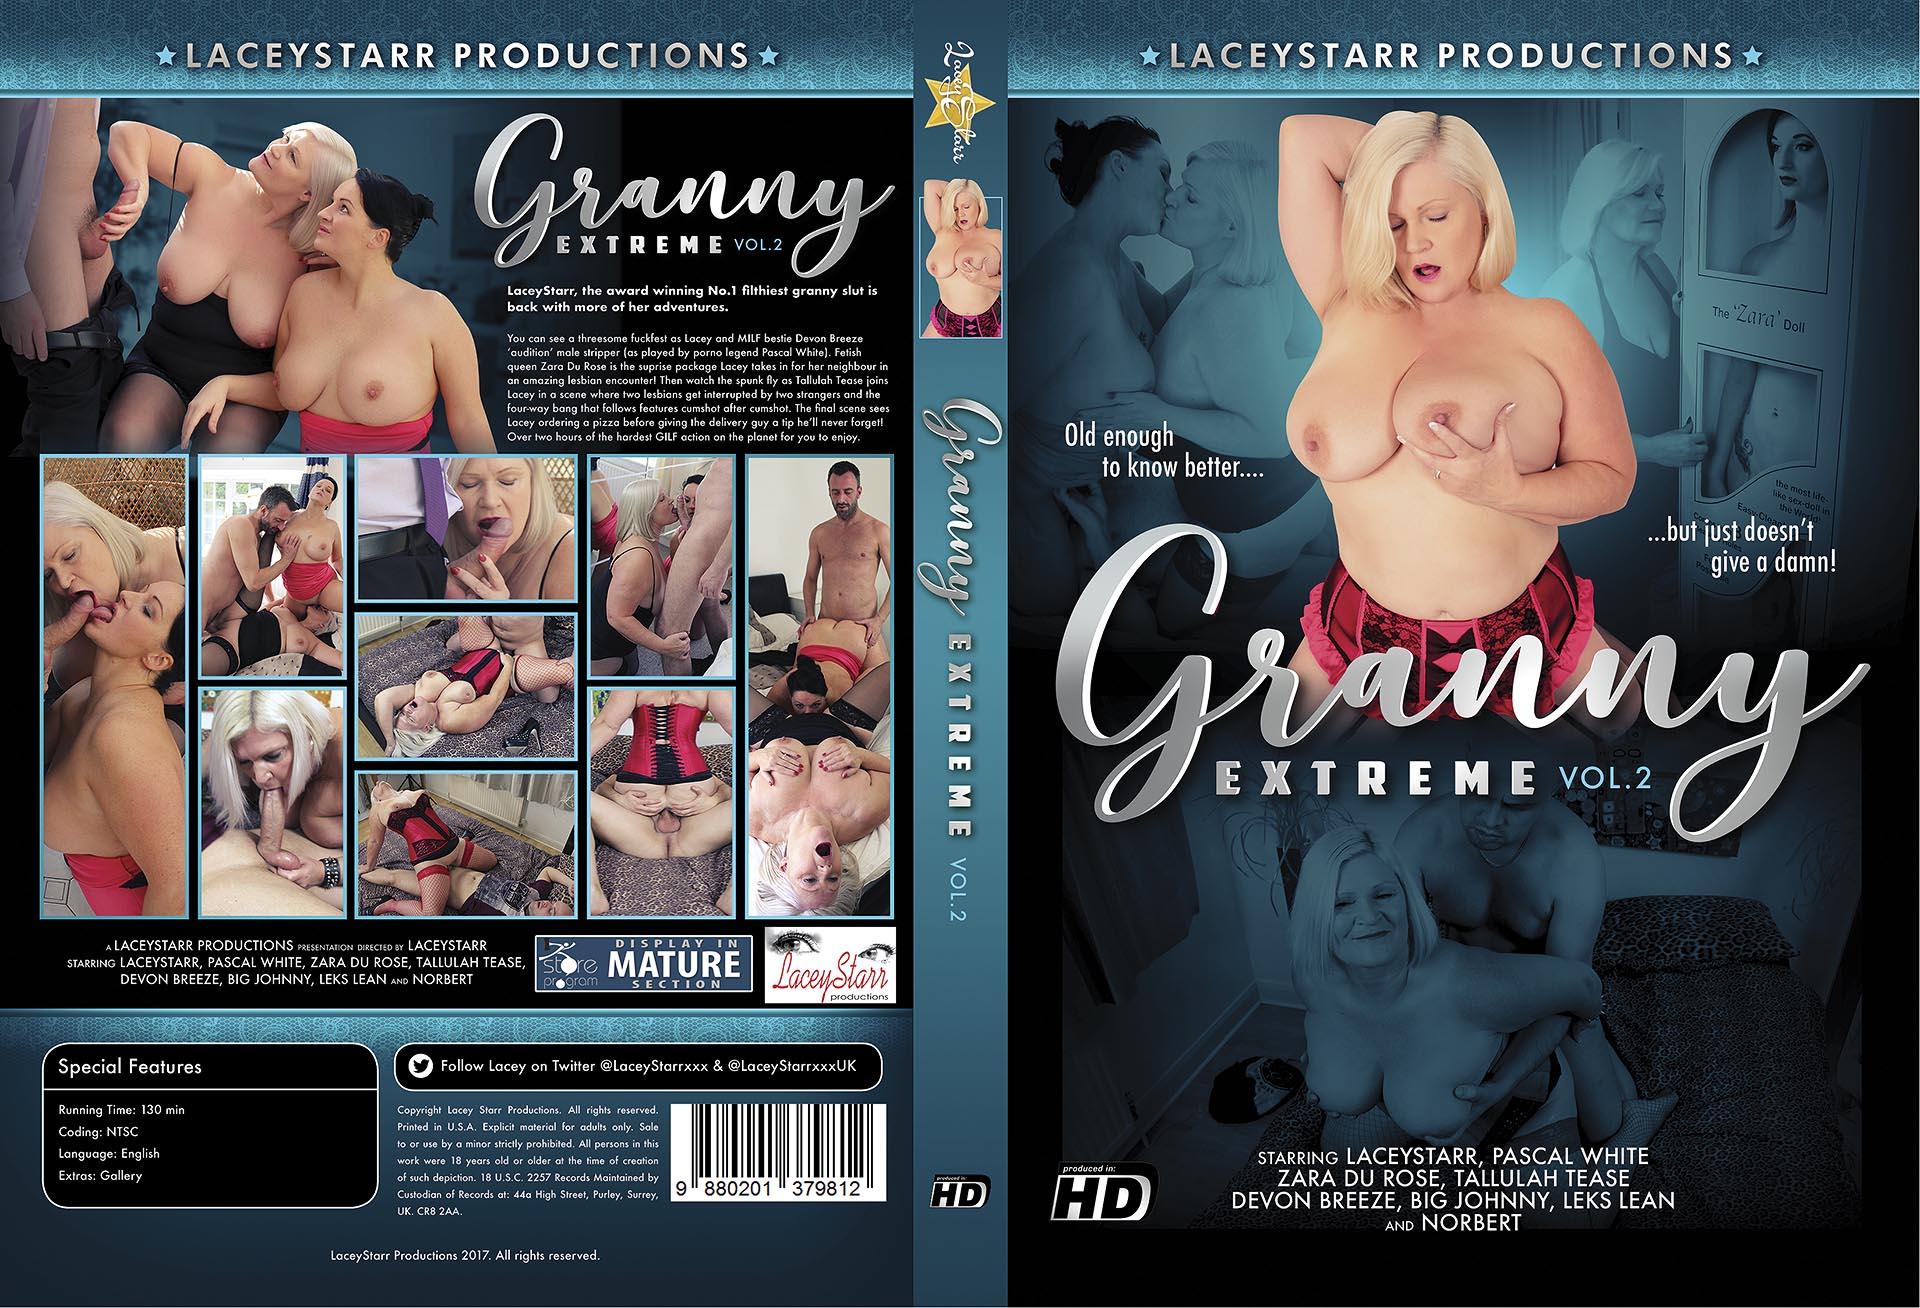 LS_GrannyExtreme_Volume2_UK_Sleeve_Large.jpg